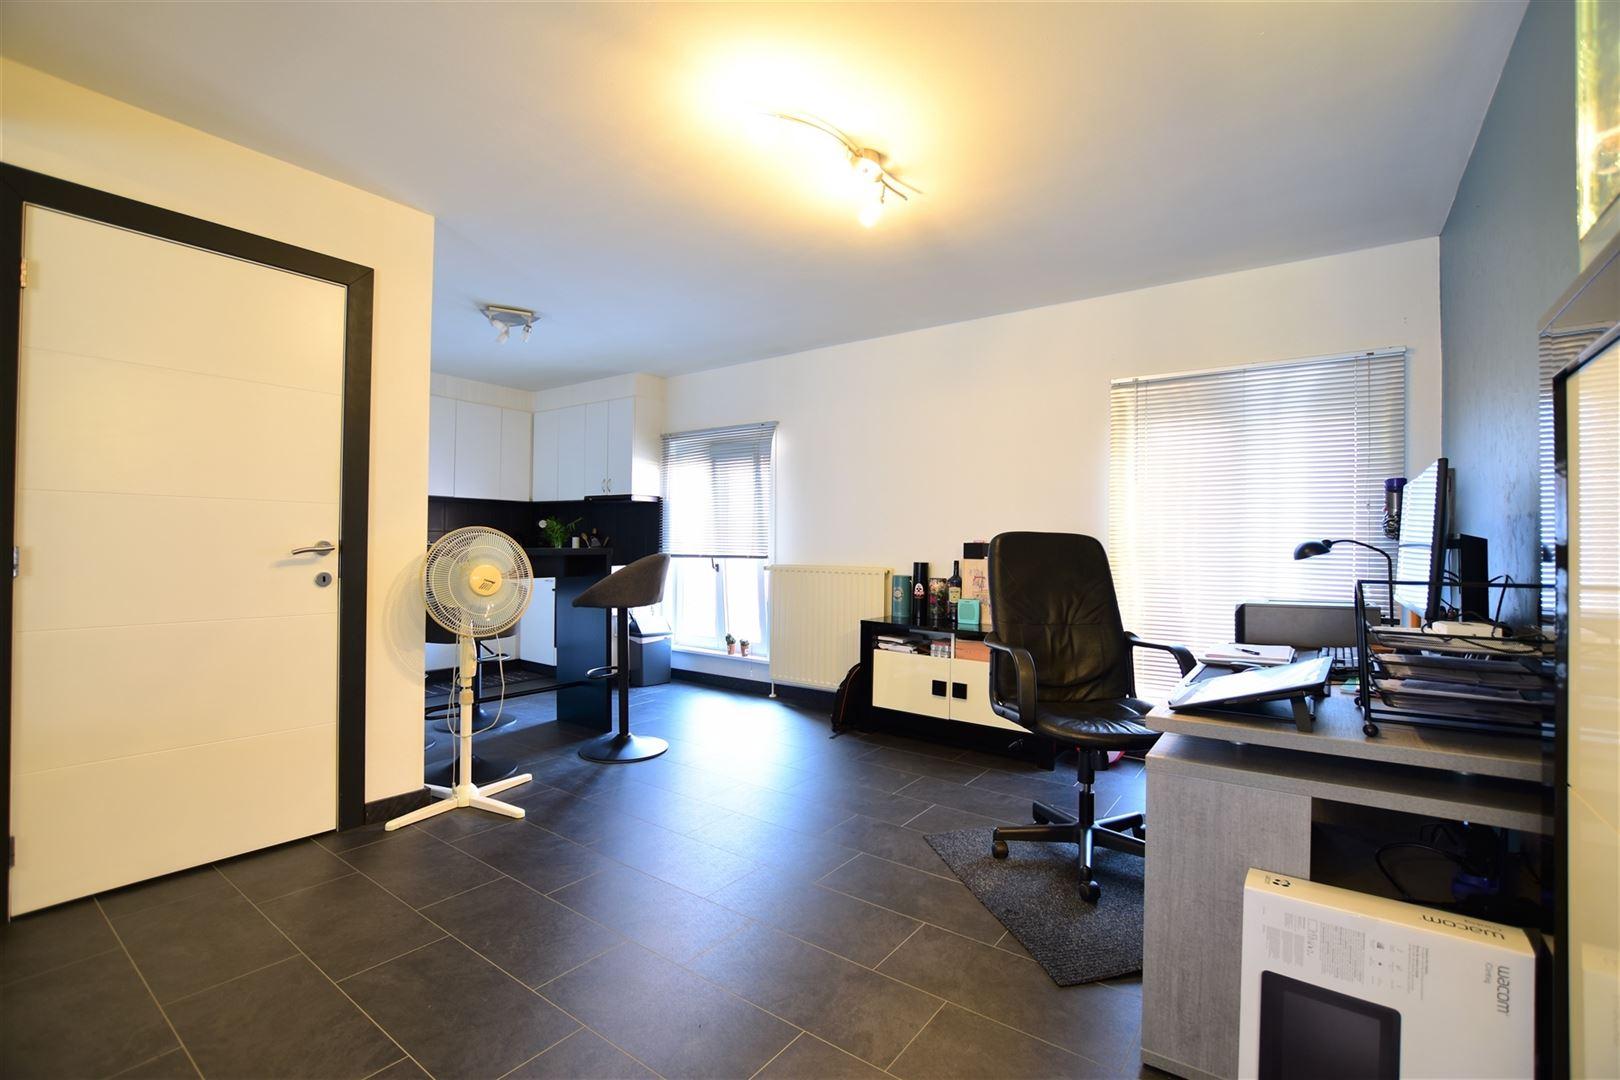 Foto 5 : Duplex/triplex te 9200 BAASRODE (België) - Prijs € 159.000